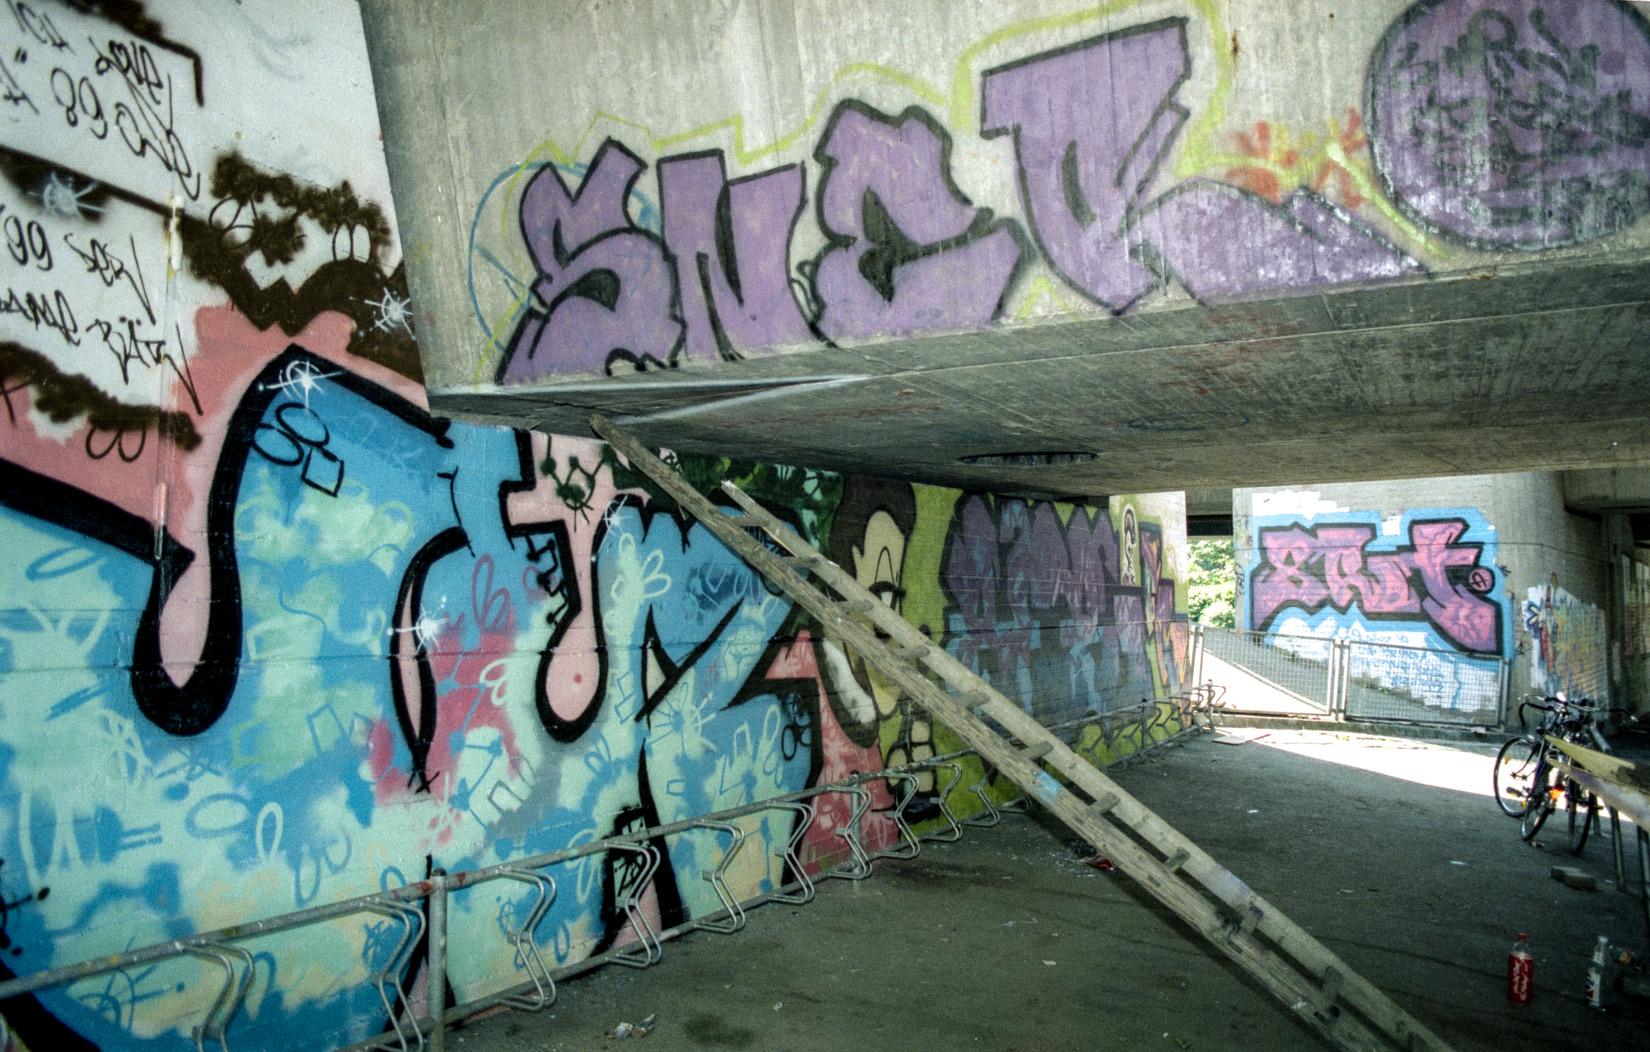 Frankfurt_Graffiti_1988_1989_H88_FRC (7 von 25)